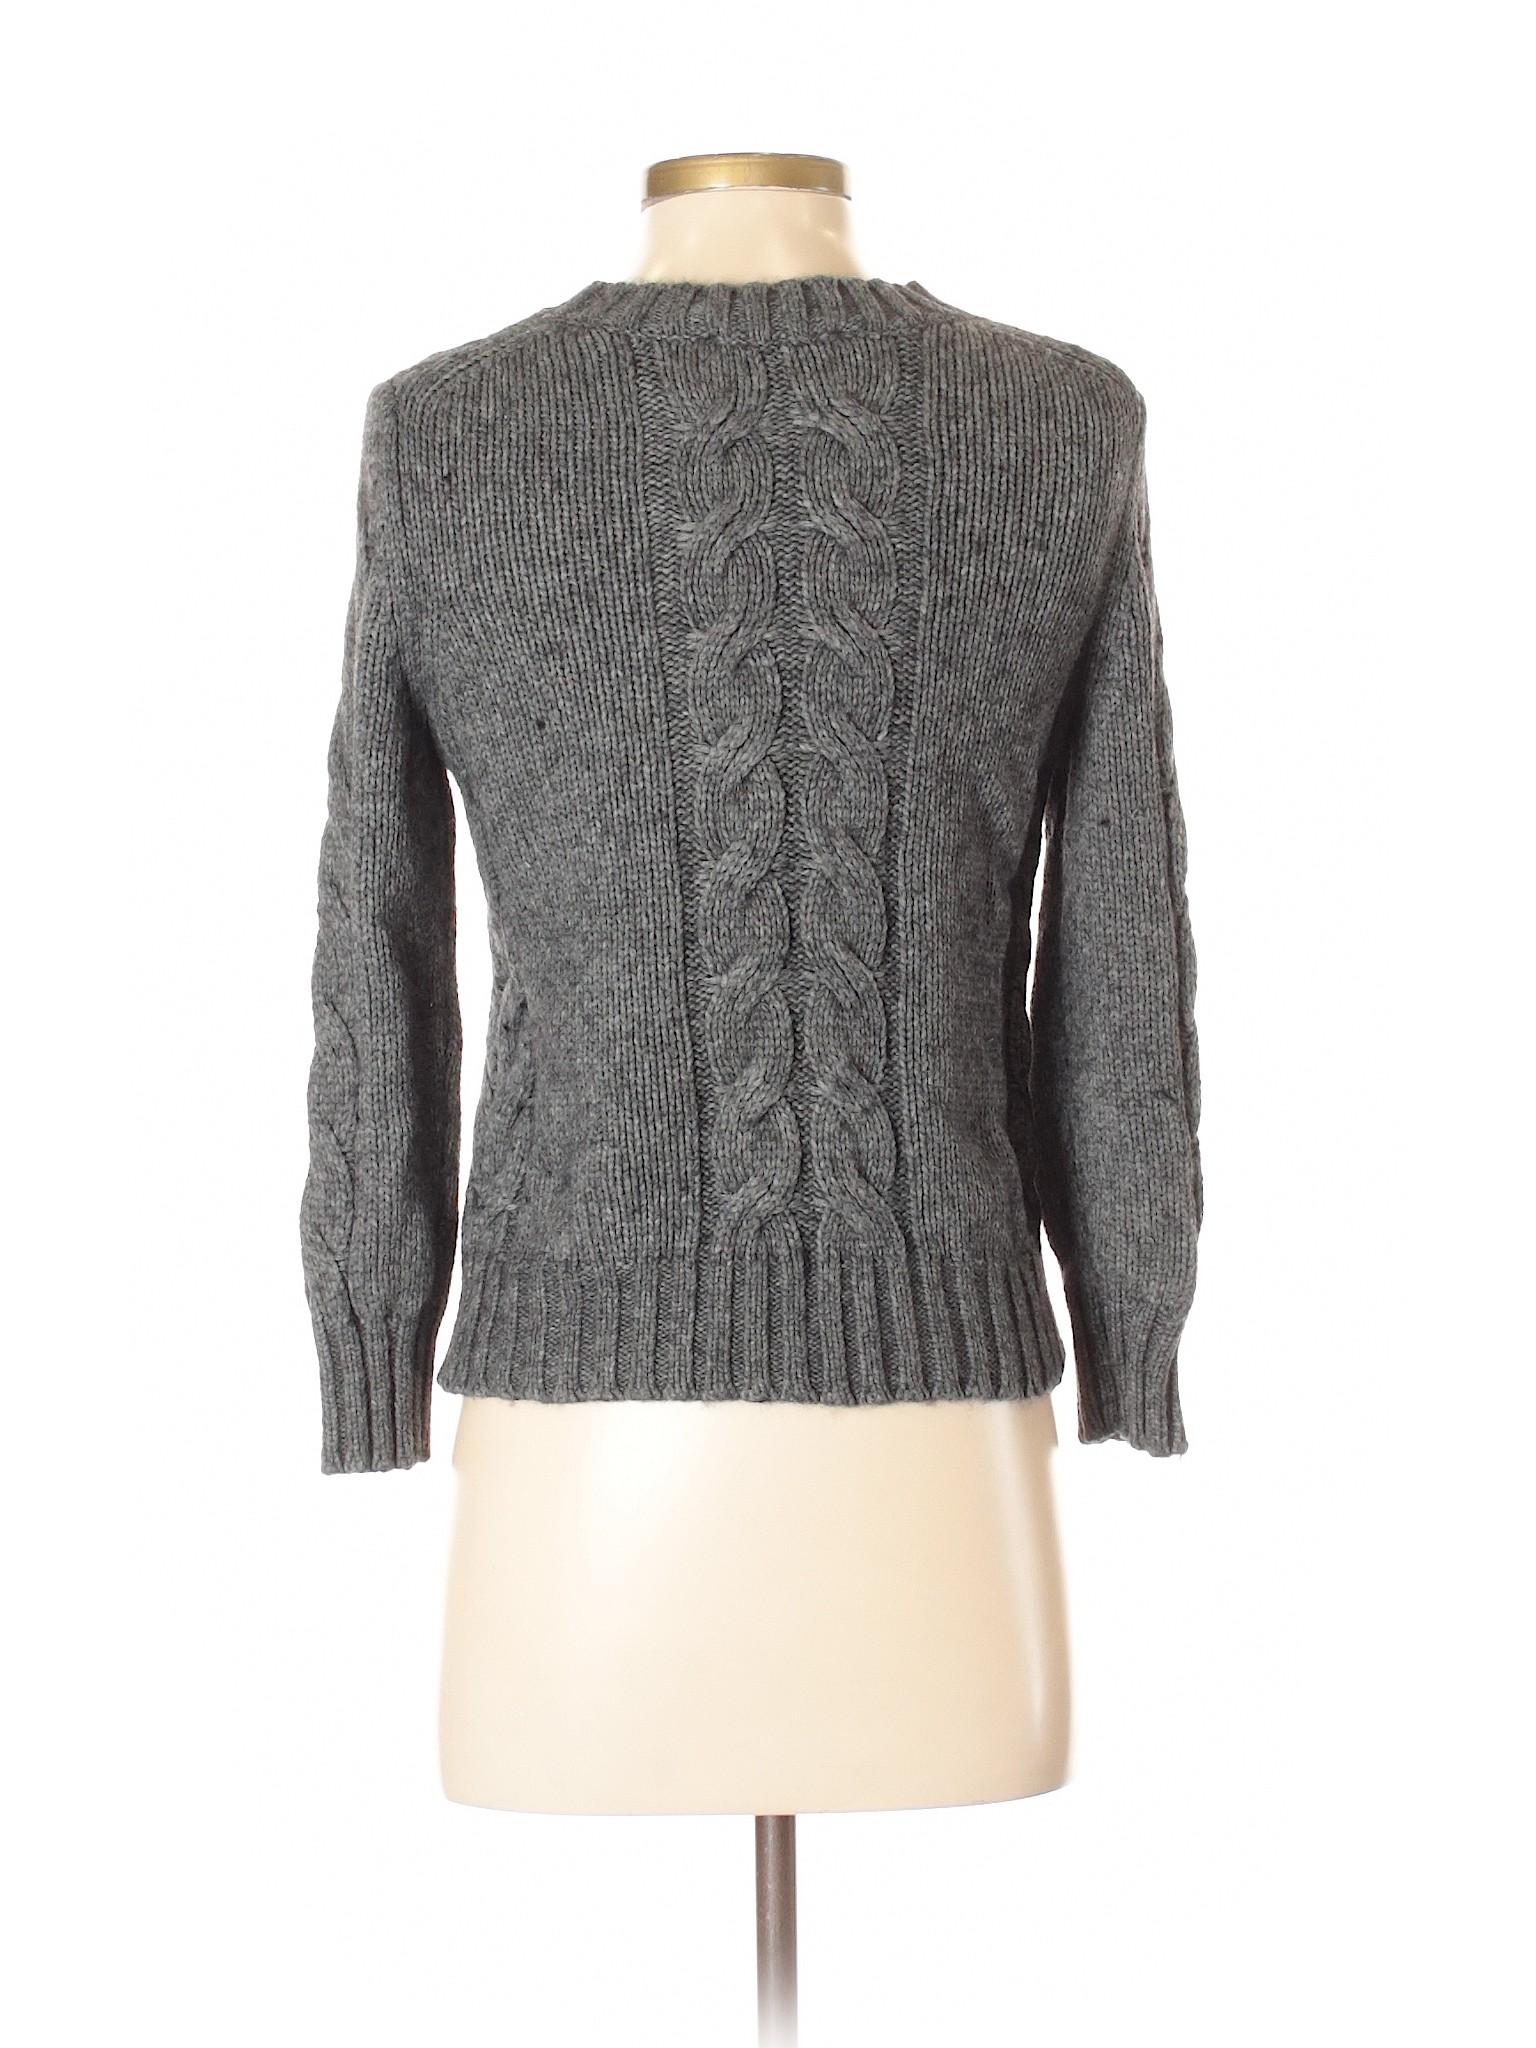 Boutique Boutique Ann Sweater Pullover Ann Taylor wOqd5En1